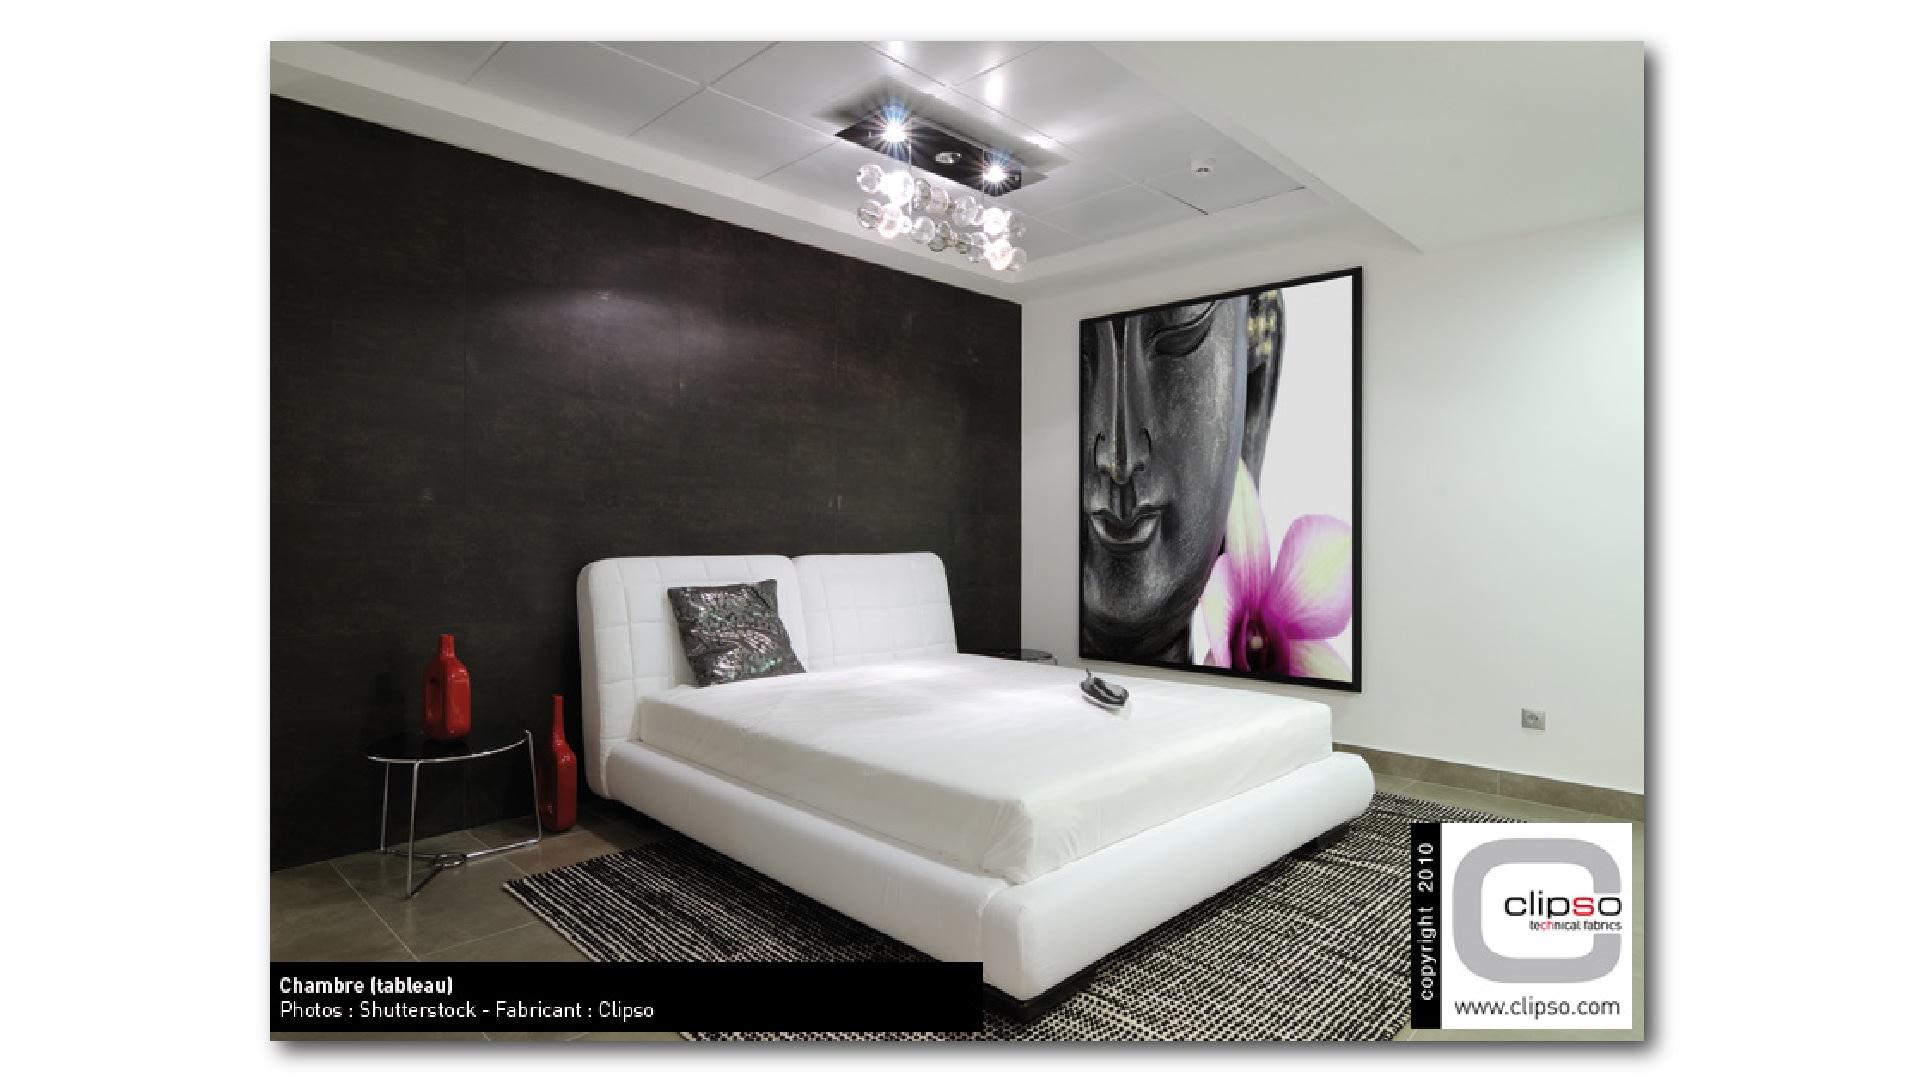 Clipso-Standard_Clipso-Print-Wand-_Decke-Schlafzimmer_pqnpba